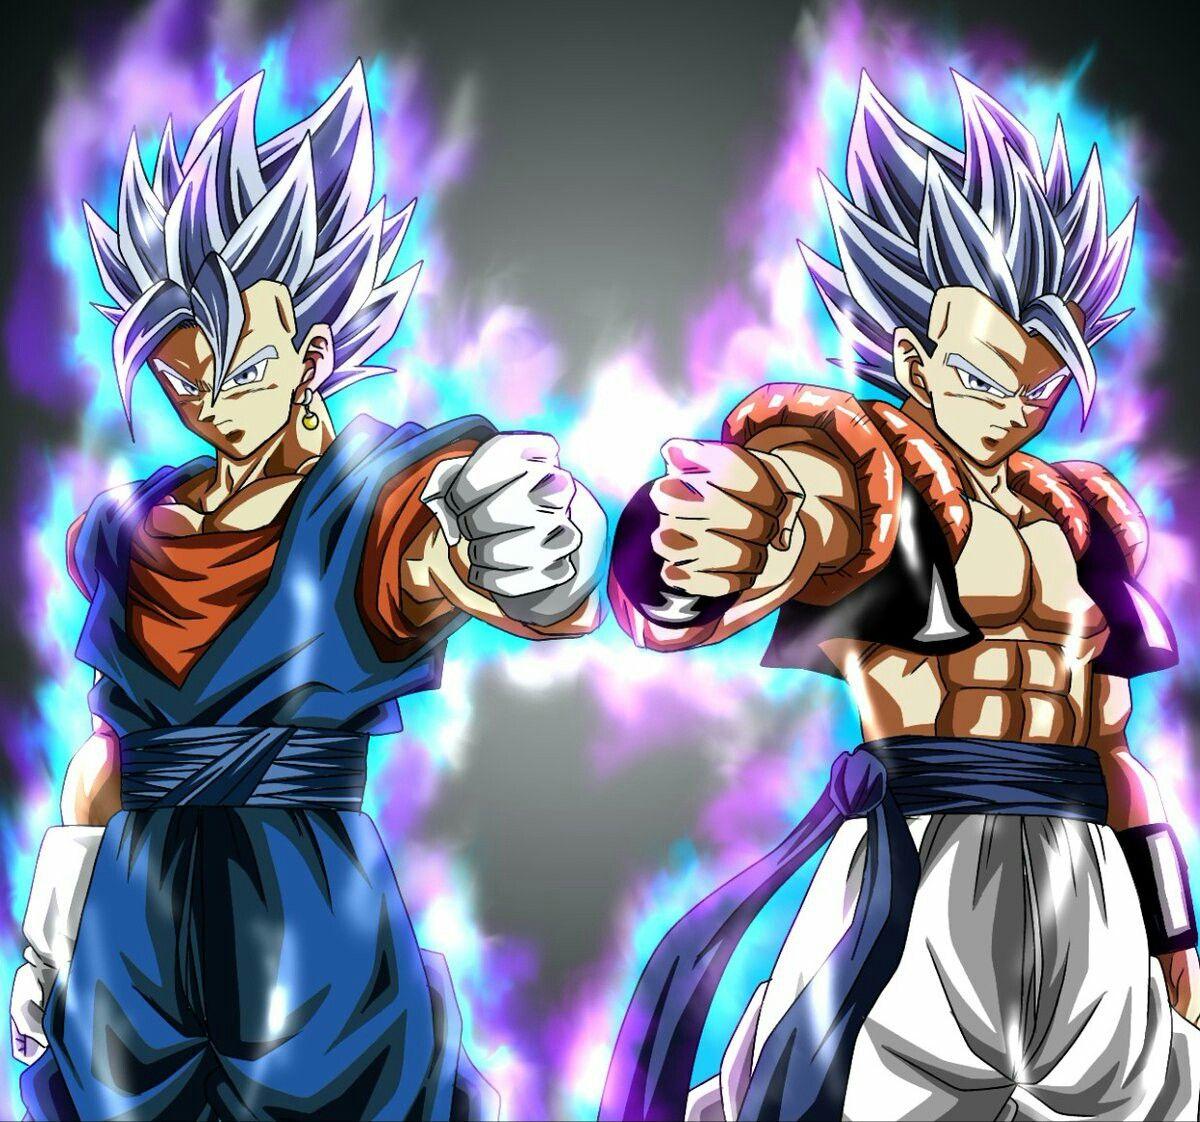 Vegetto Gogeta Migatte Kansei Figuras De Goku Vegito Y Gogeta Personajes De Goku